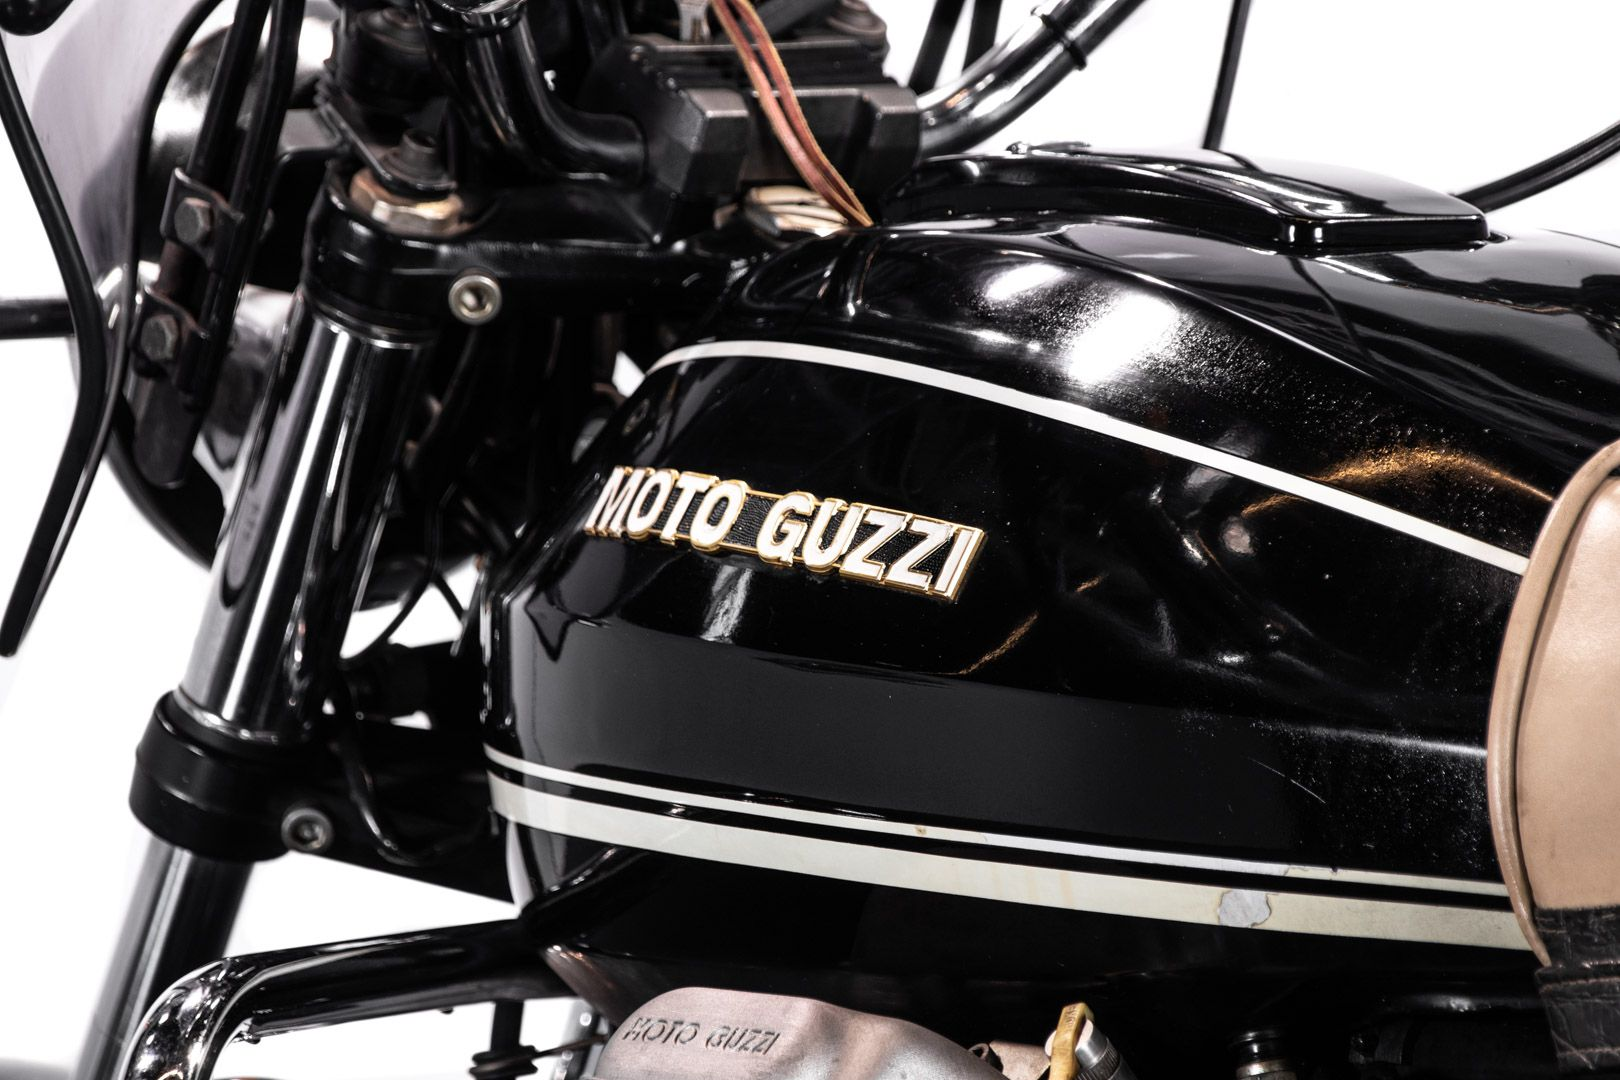 1981 Moto Guzzi 850 T3 California 83251